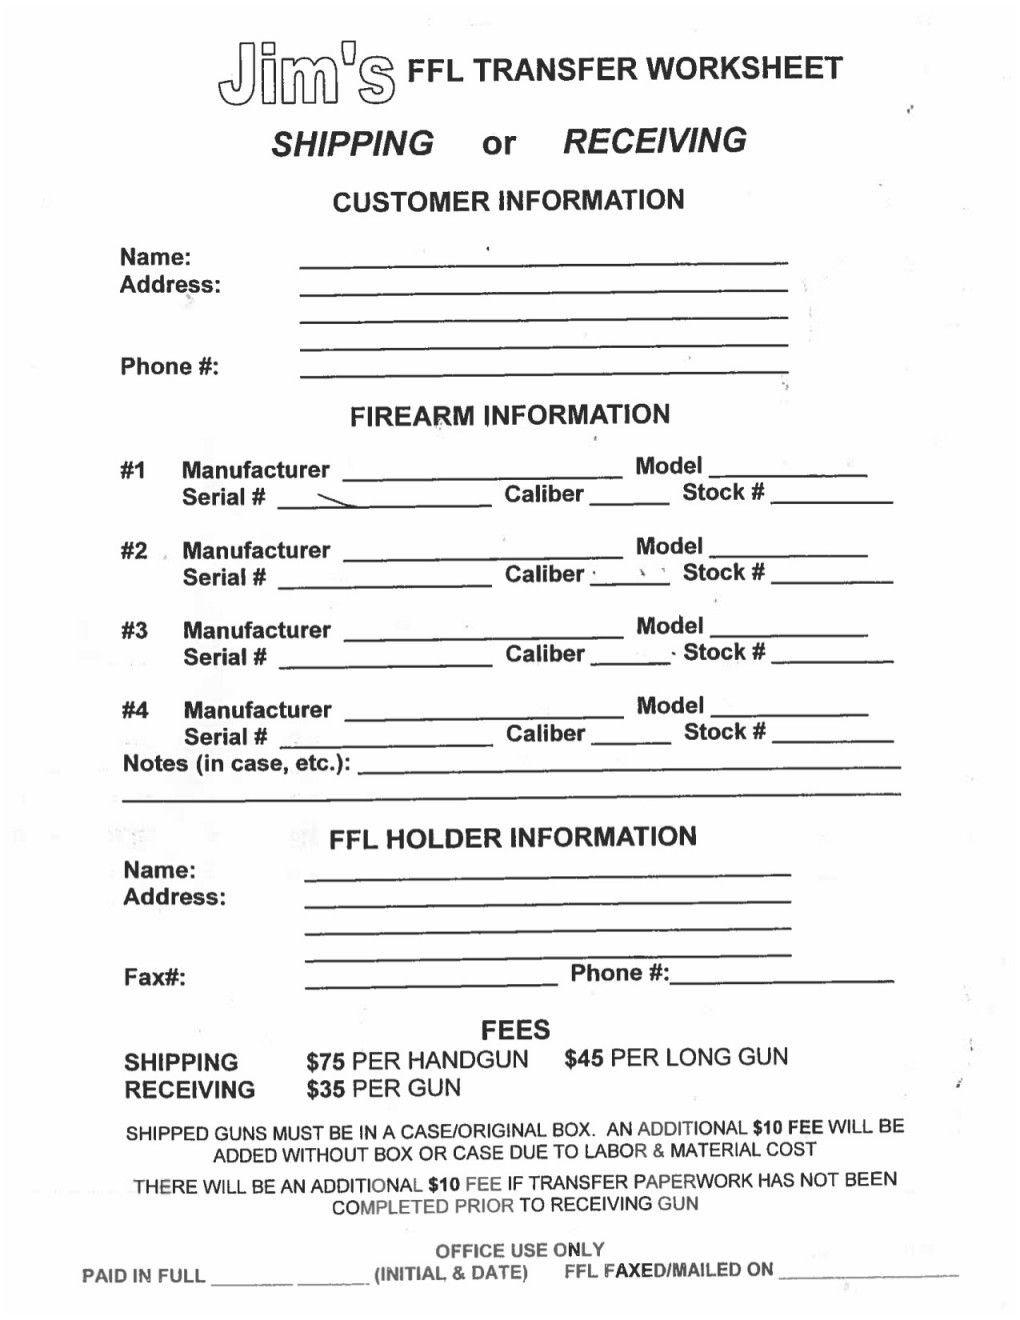 Free Layaway Agreement Forms Good Layaway Agreement Template Photos - Free Printable Layaway Forms